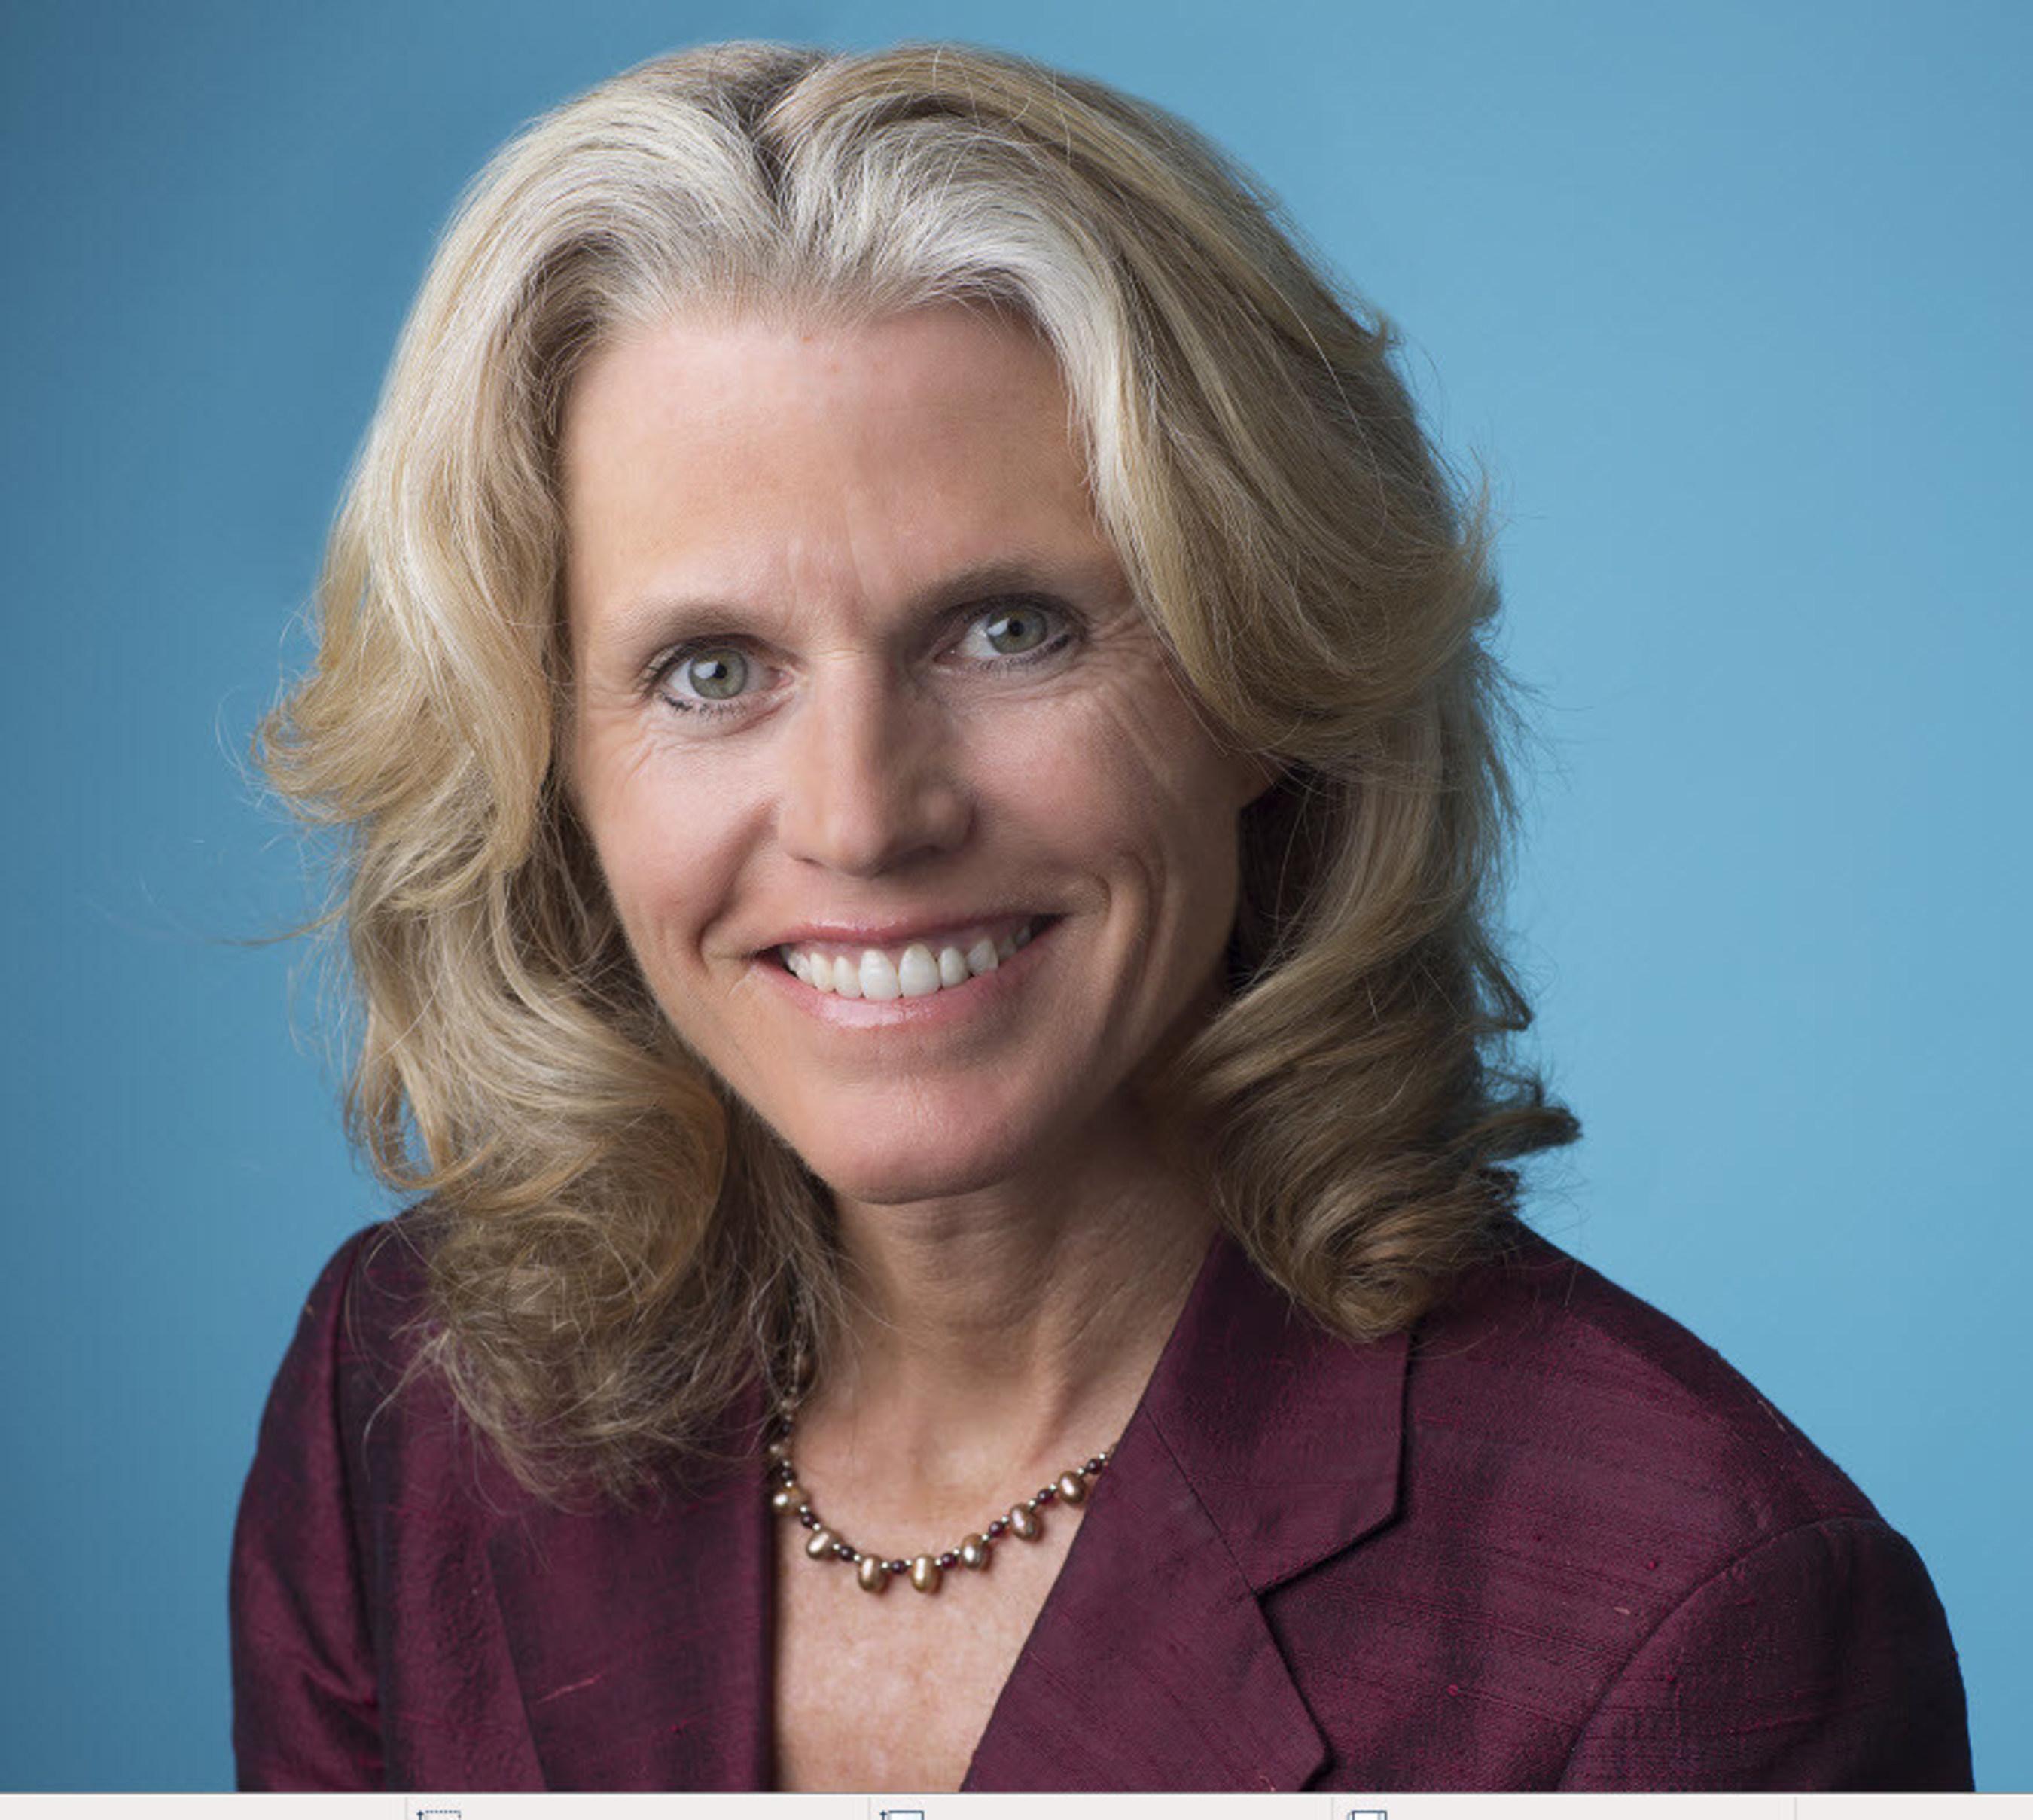 Denise Jackson, General Counsel and Senior Vice President, AMN Healthcare